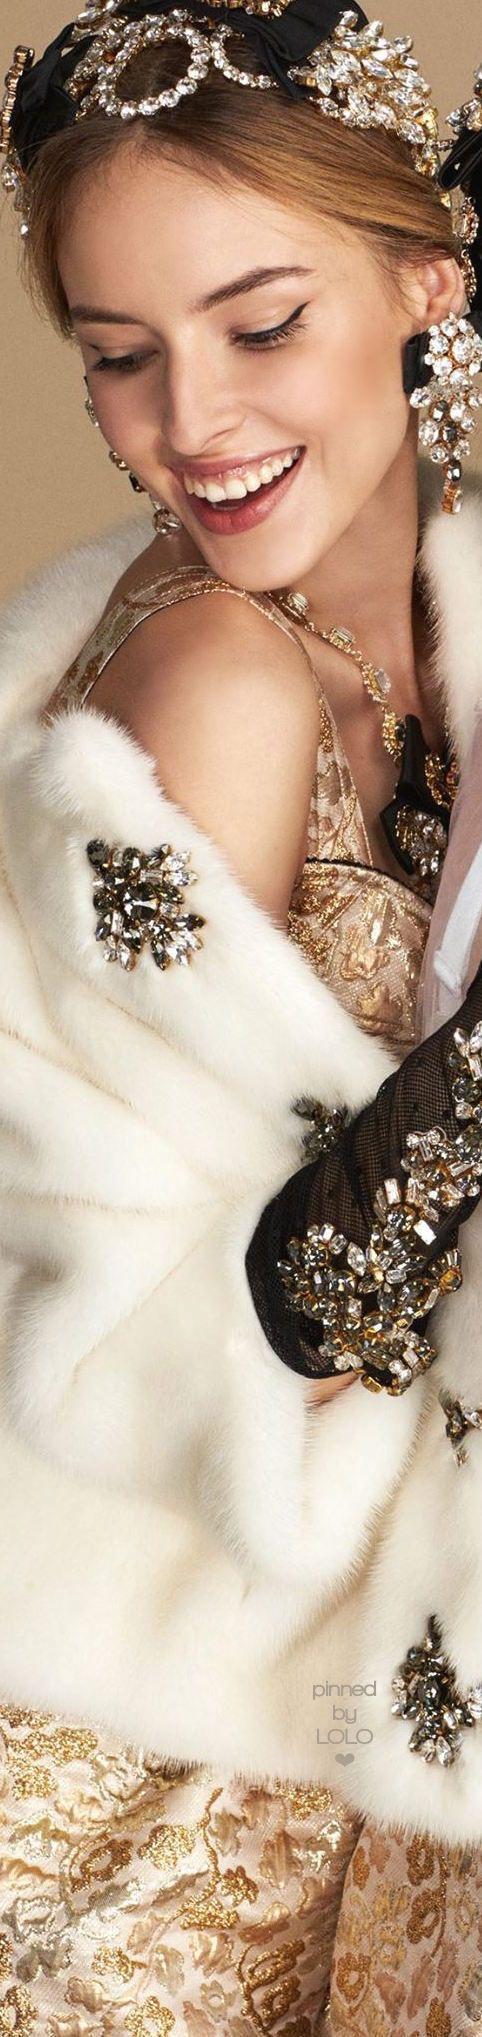 Dolce & Gabbana luxury jewelry #moderndesign #design #luxurydesign exclusive jewelry, expensive brands, inspiration http://devis-demenagement-tunisie.com/demenagement-beja.html